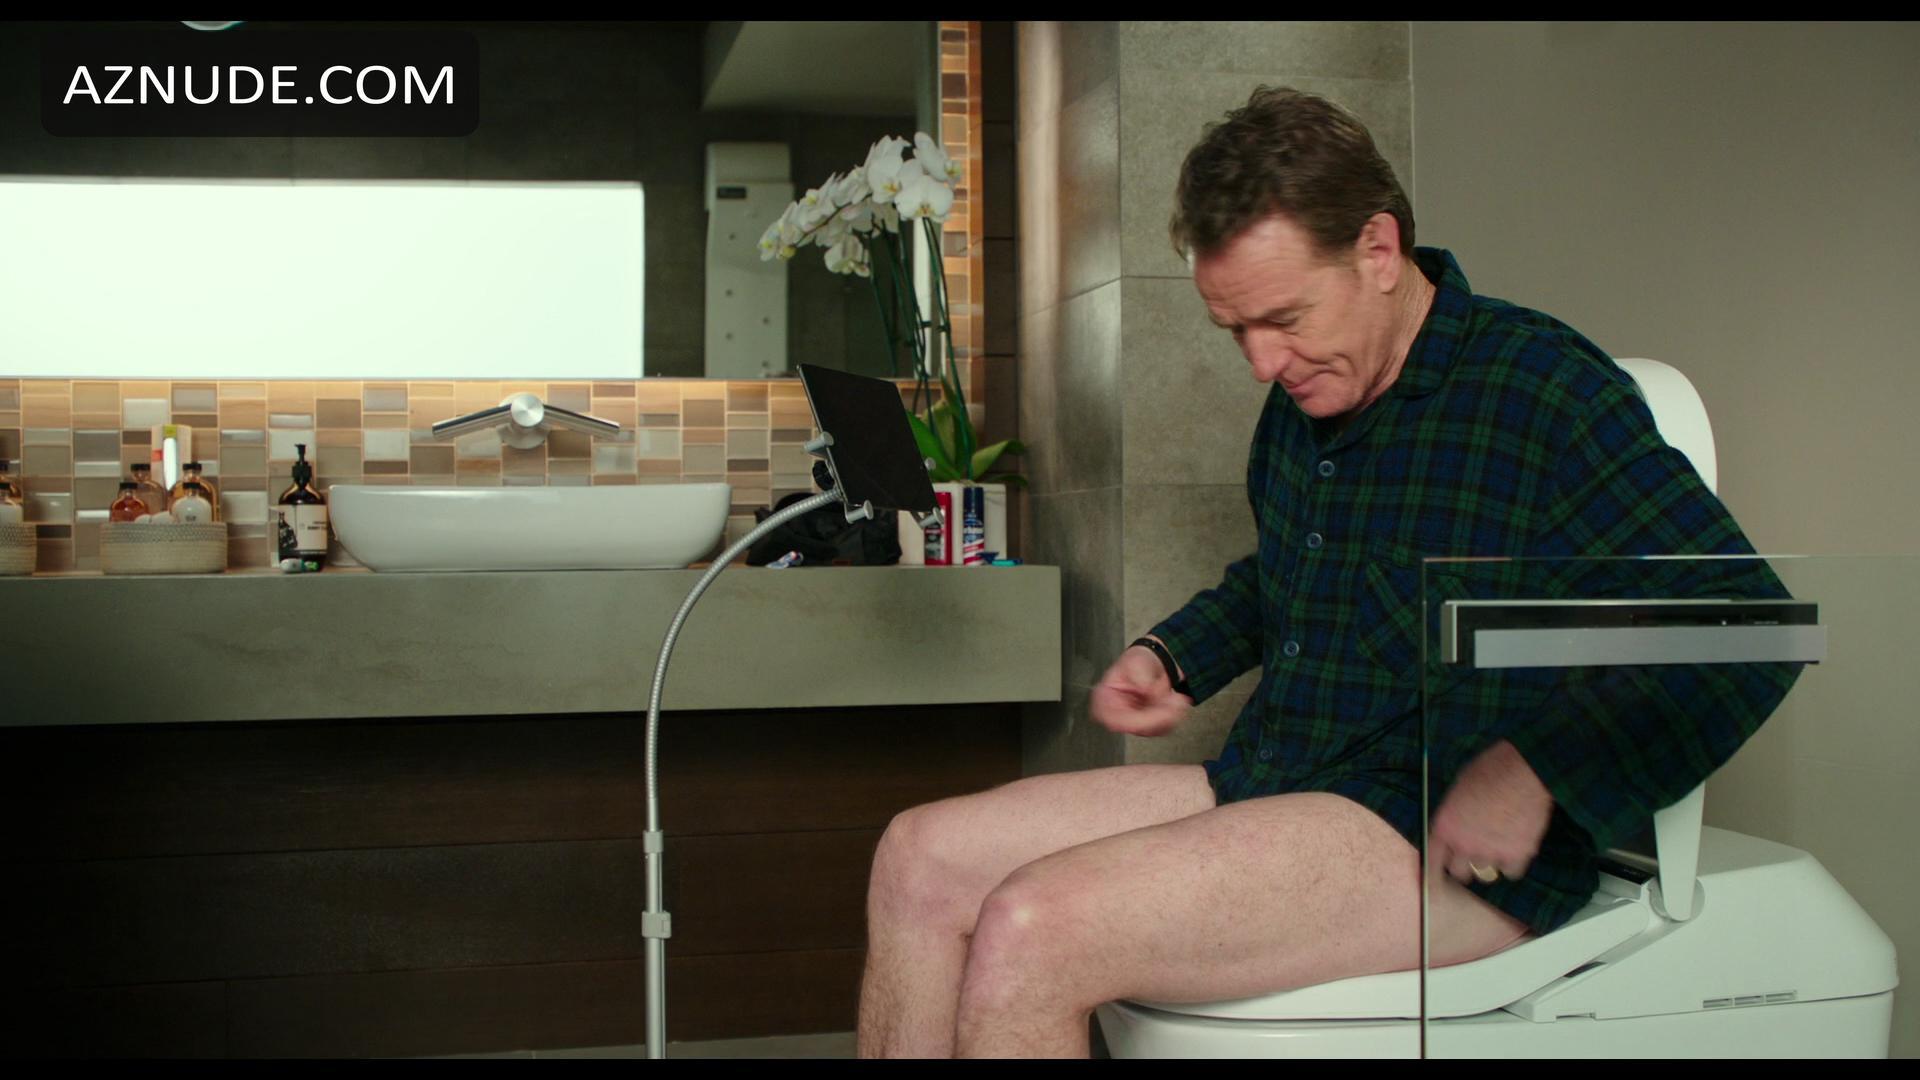 Bryan cranston on breaking naked, rocking tighty whities